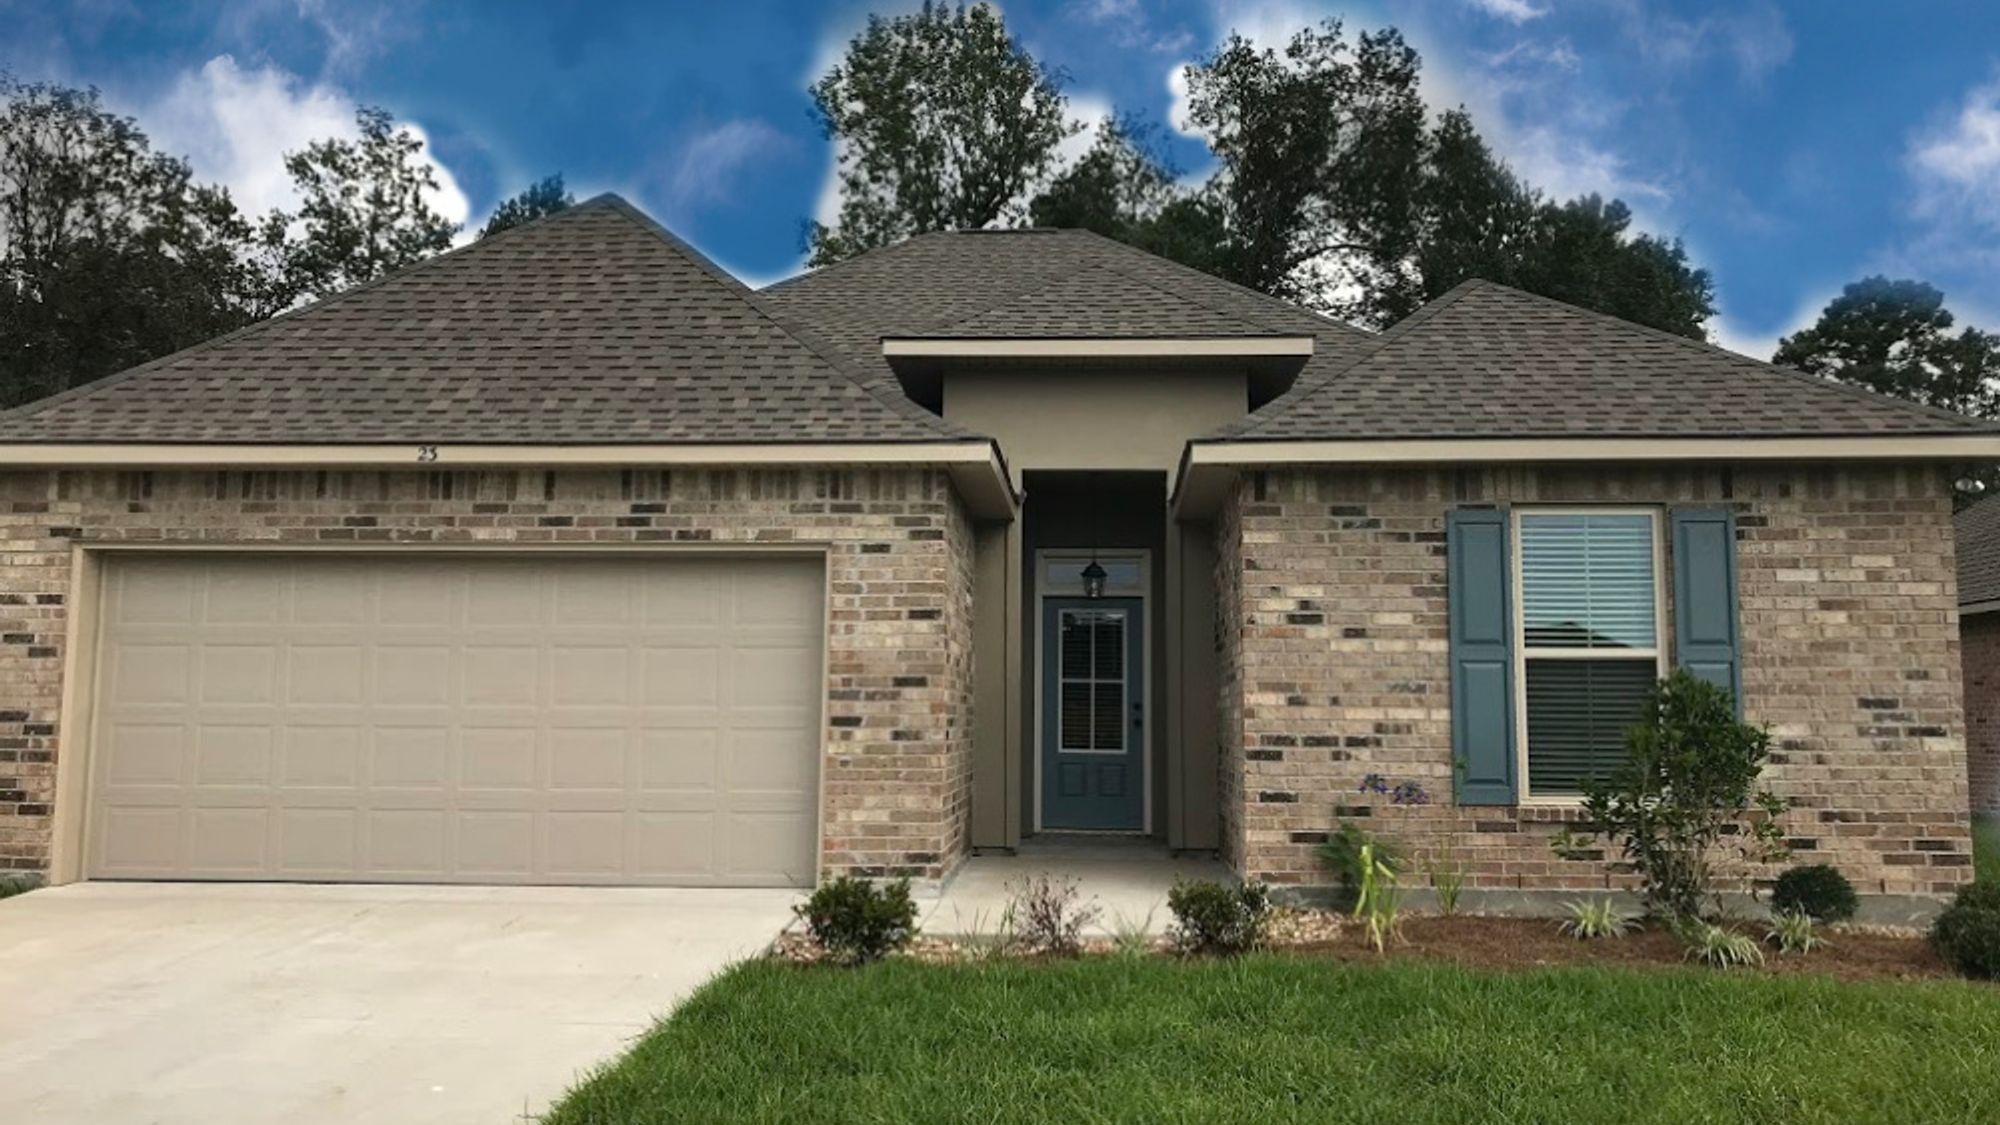 Front View - Maple Creek Community - DSLD Homes Sulphur